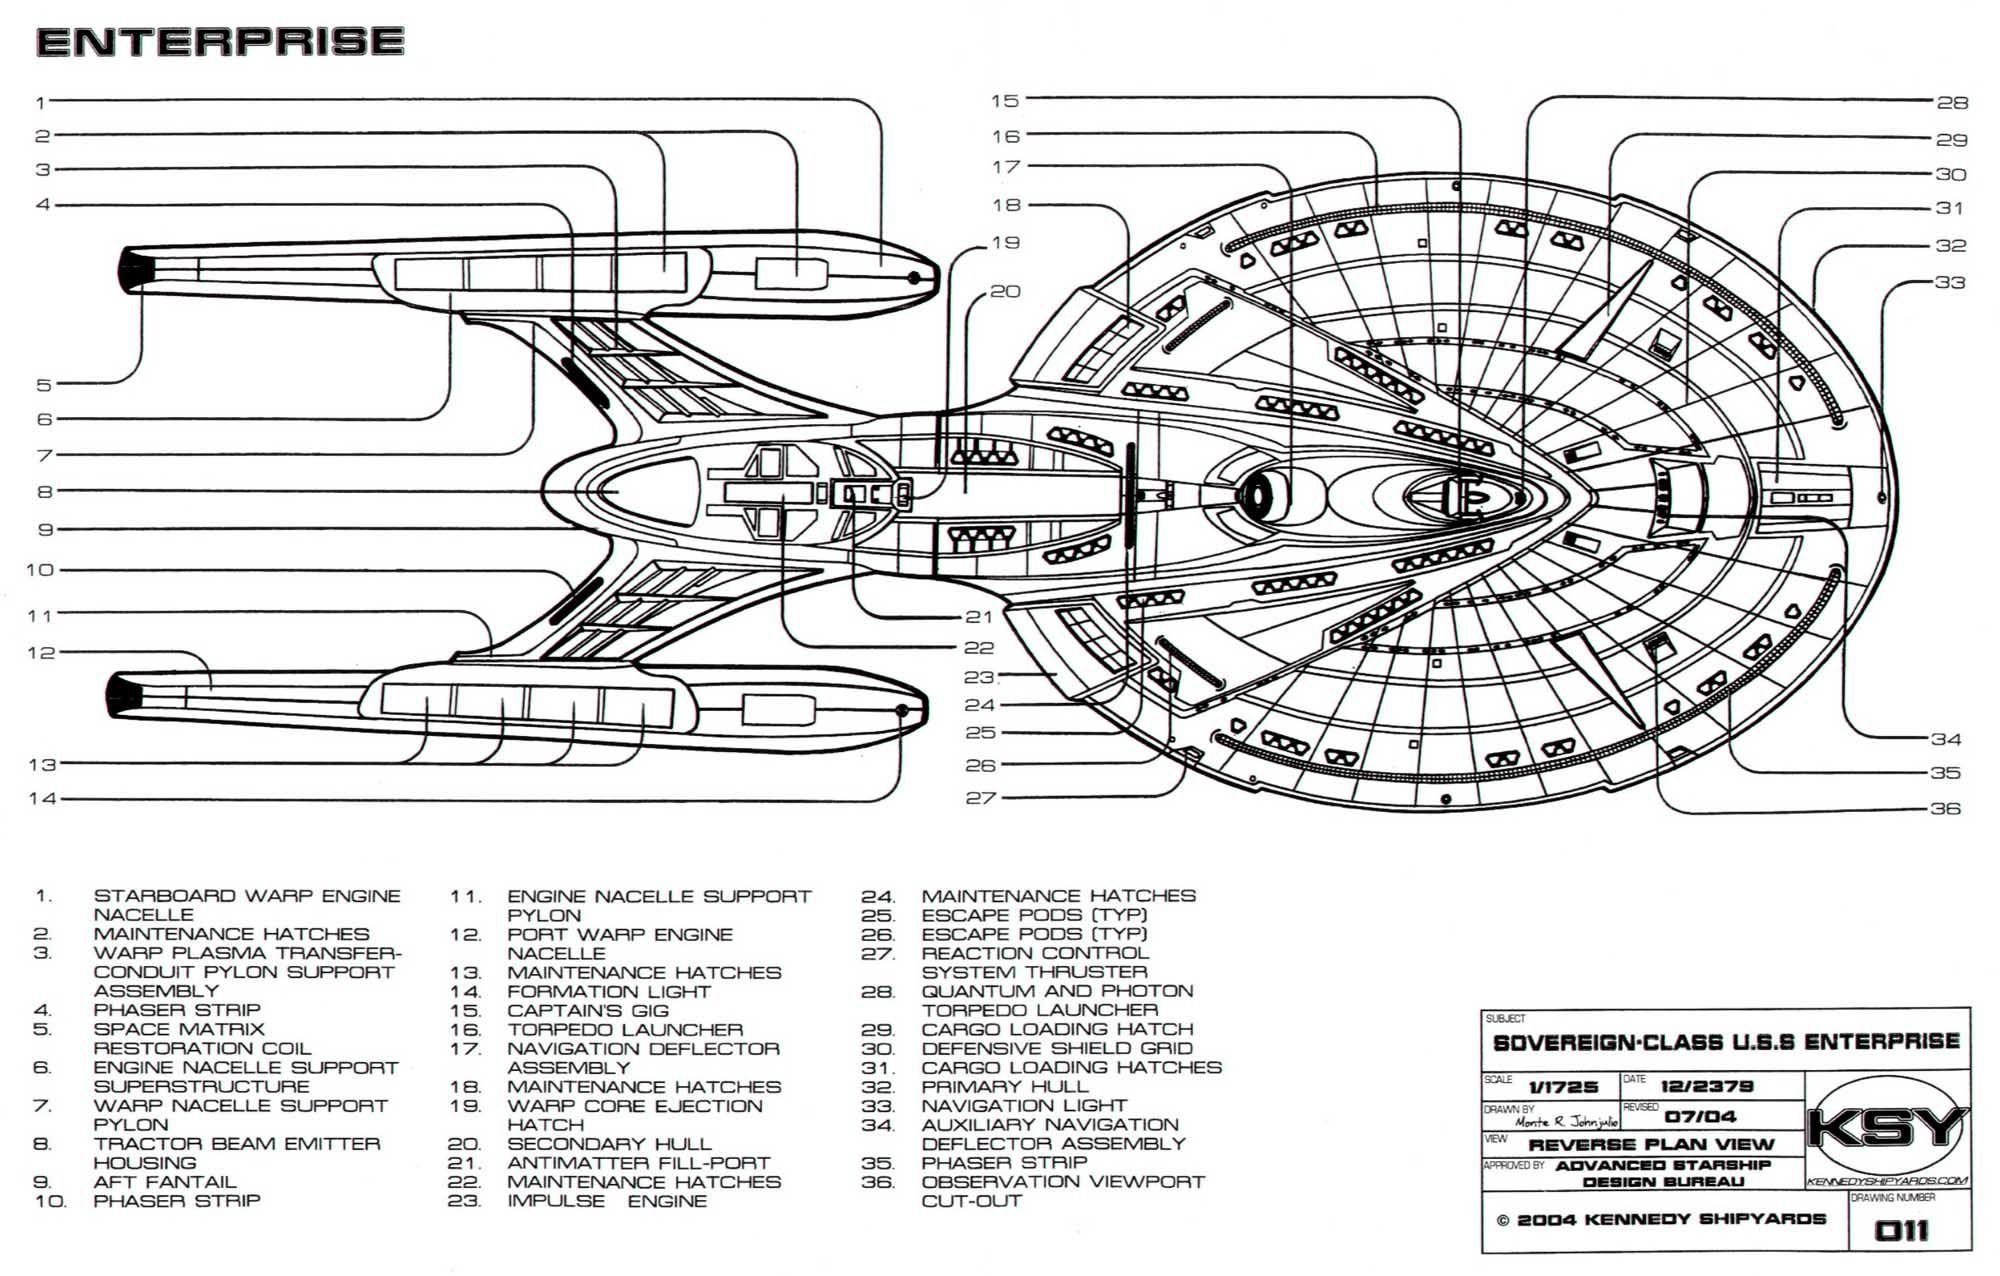 sovereign class starship schematics